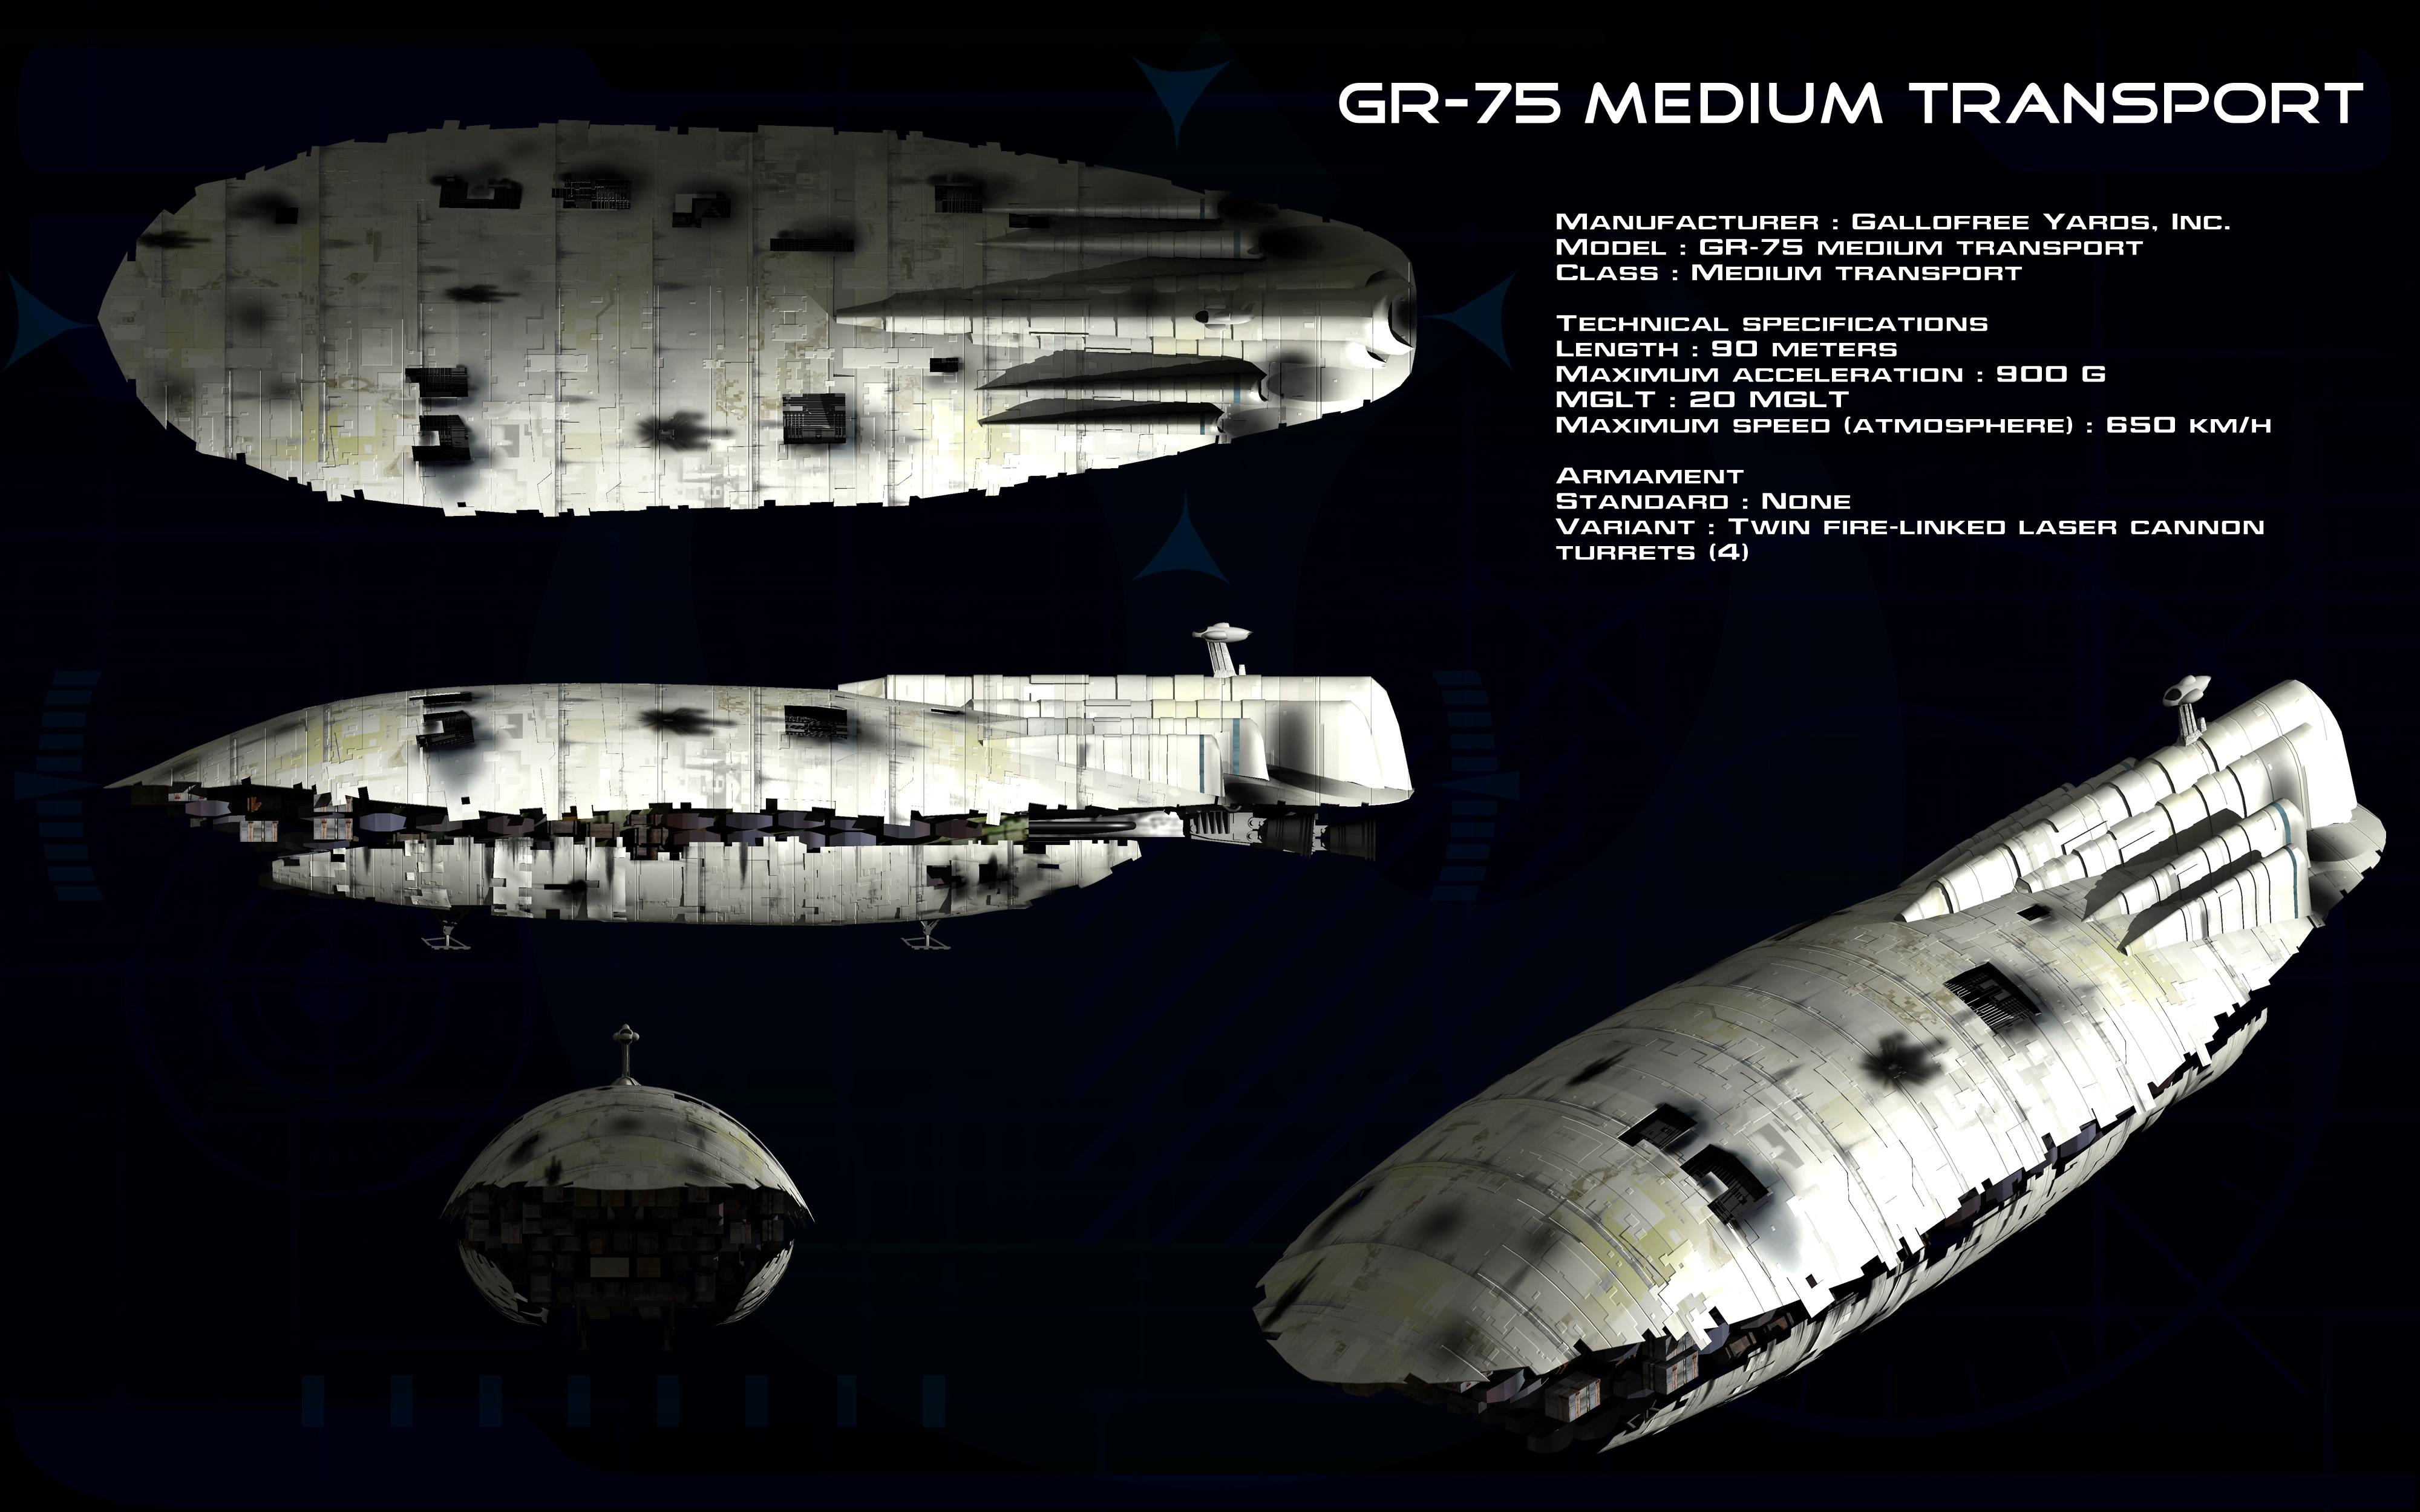 GR-75 Medium Transport ortho [updated] by unusualsuspex on